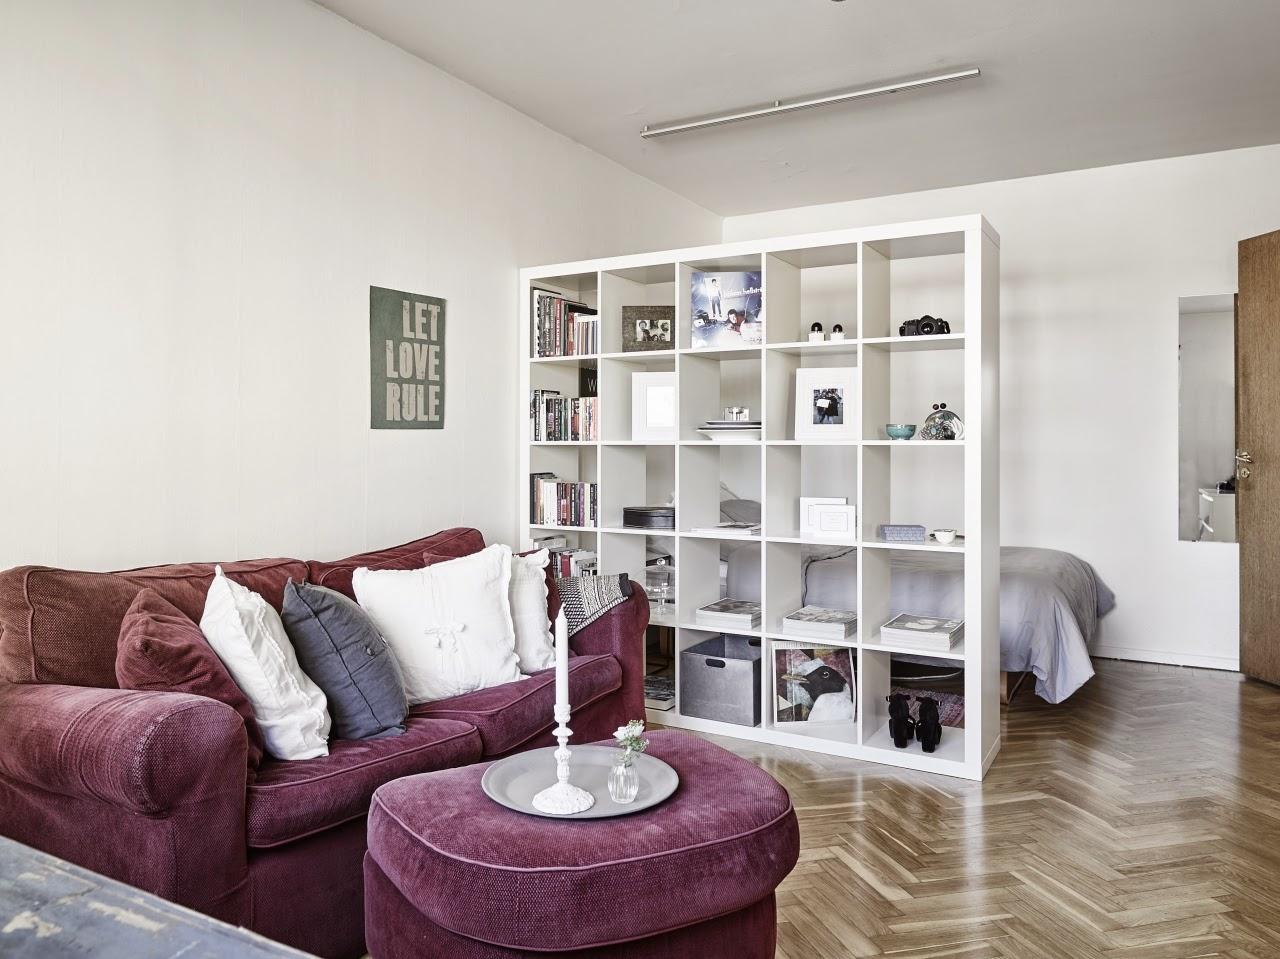 creative ordinette the ikea kallax and lack is. Black Bedroom Furniture Sets. Home Design Ideas